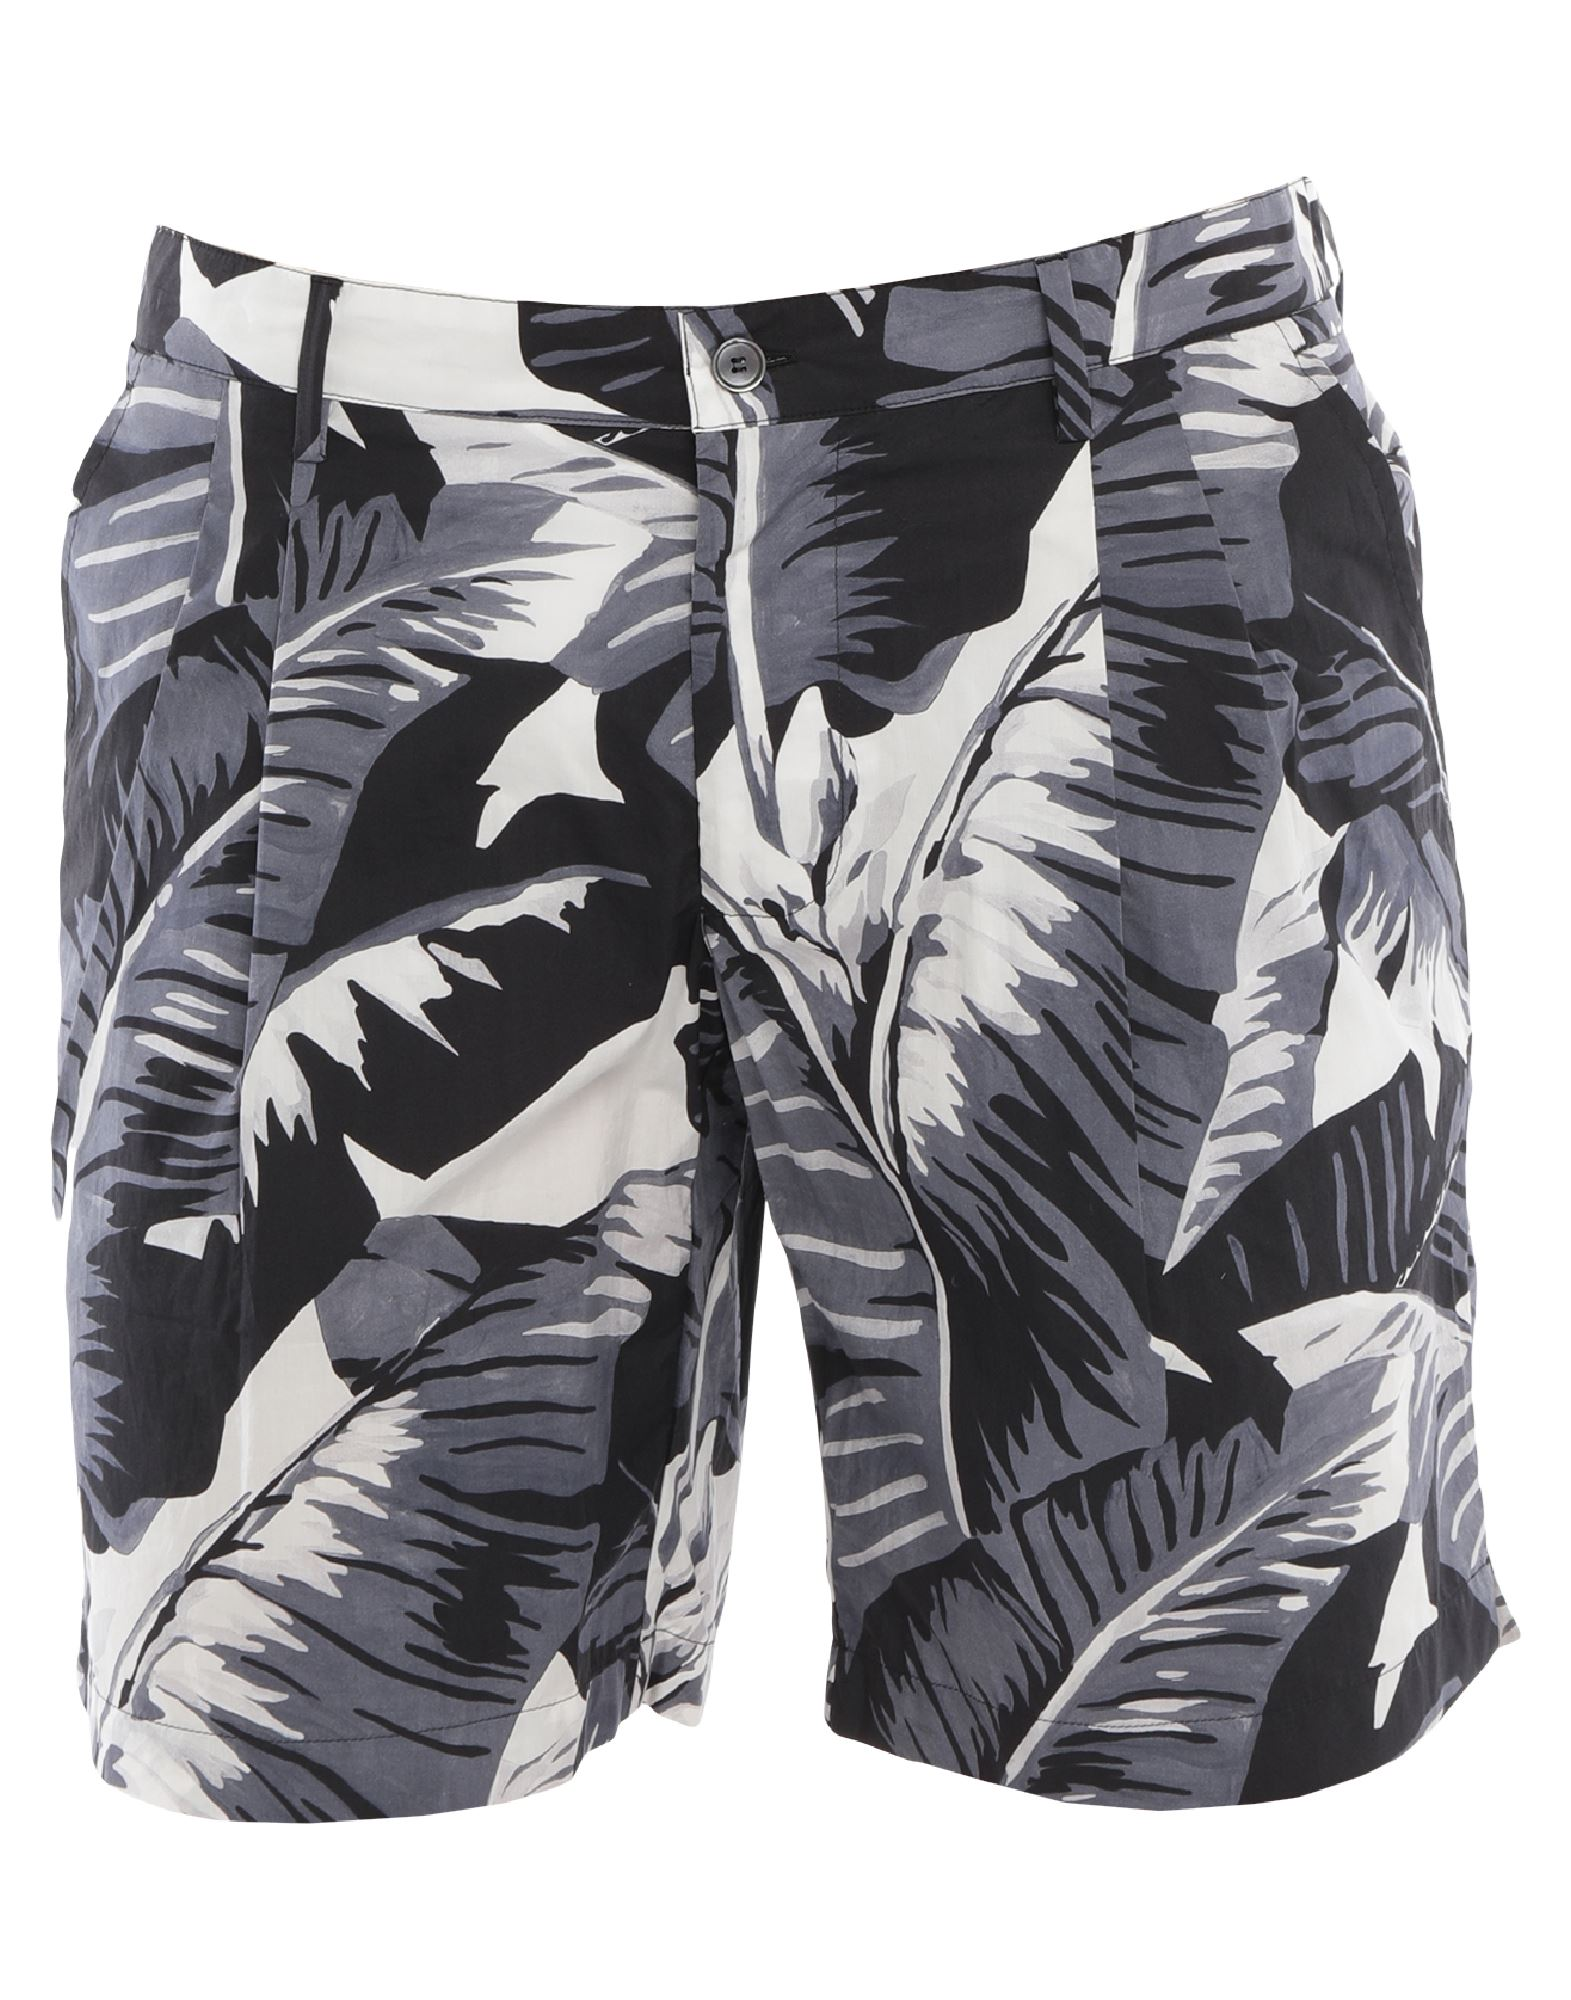 Фото - DOLCE & GABBANA BEACHWEAR Шорты для плавания john galliano beachwear шорты для плавания